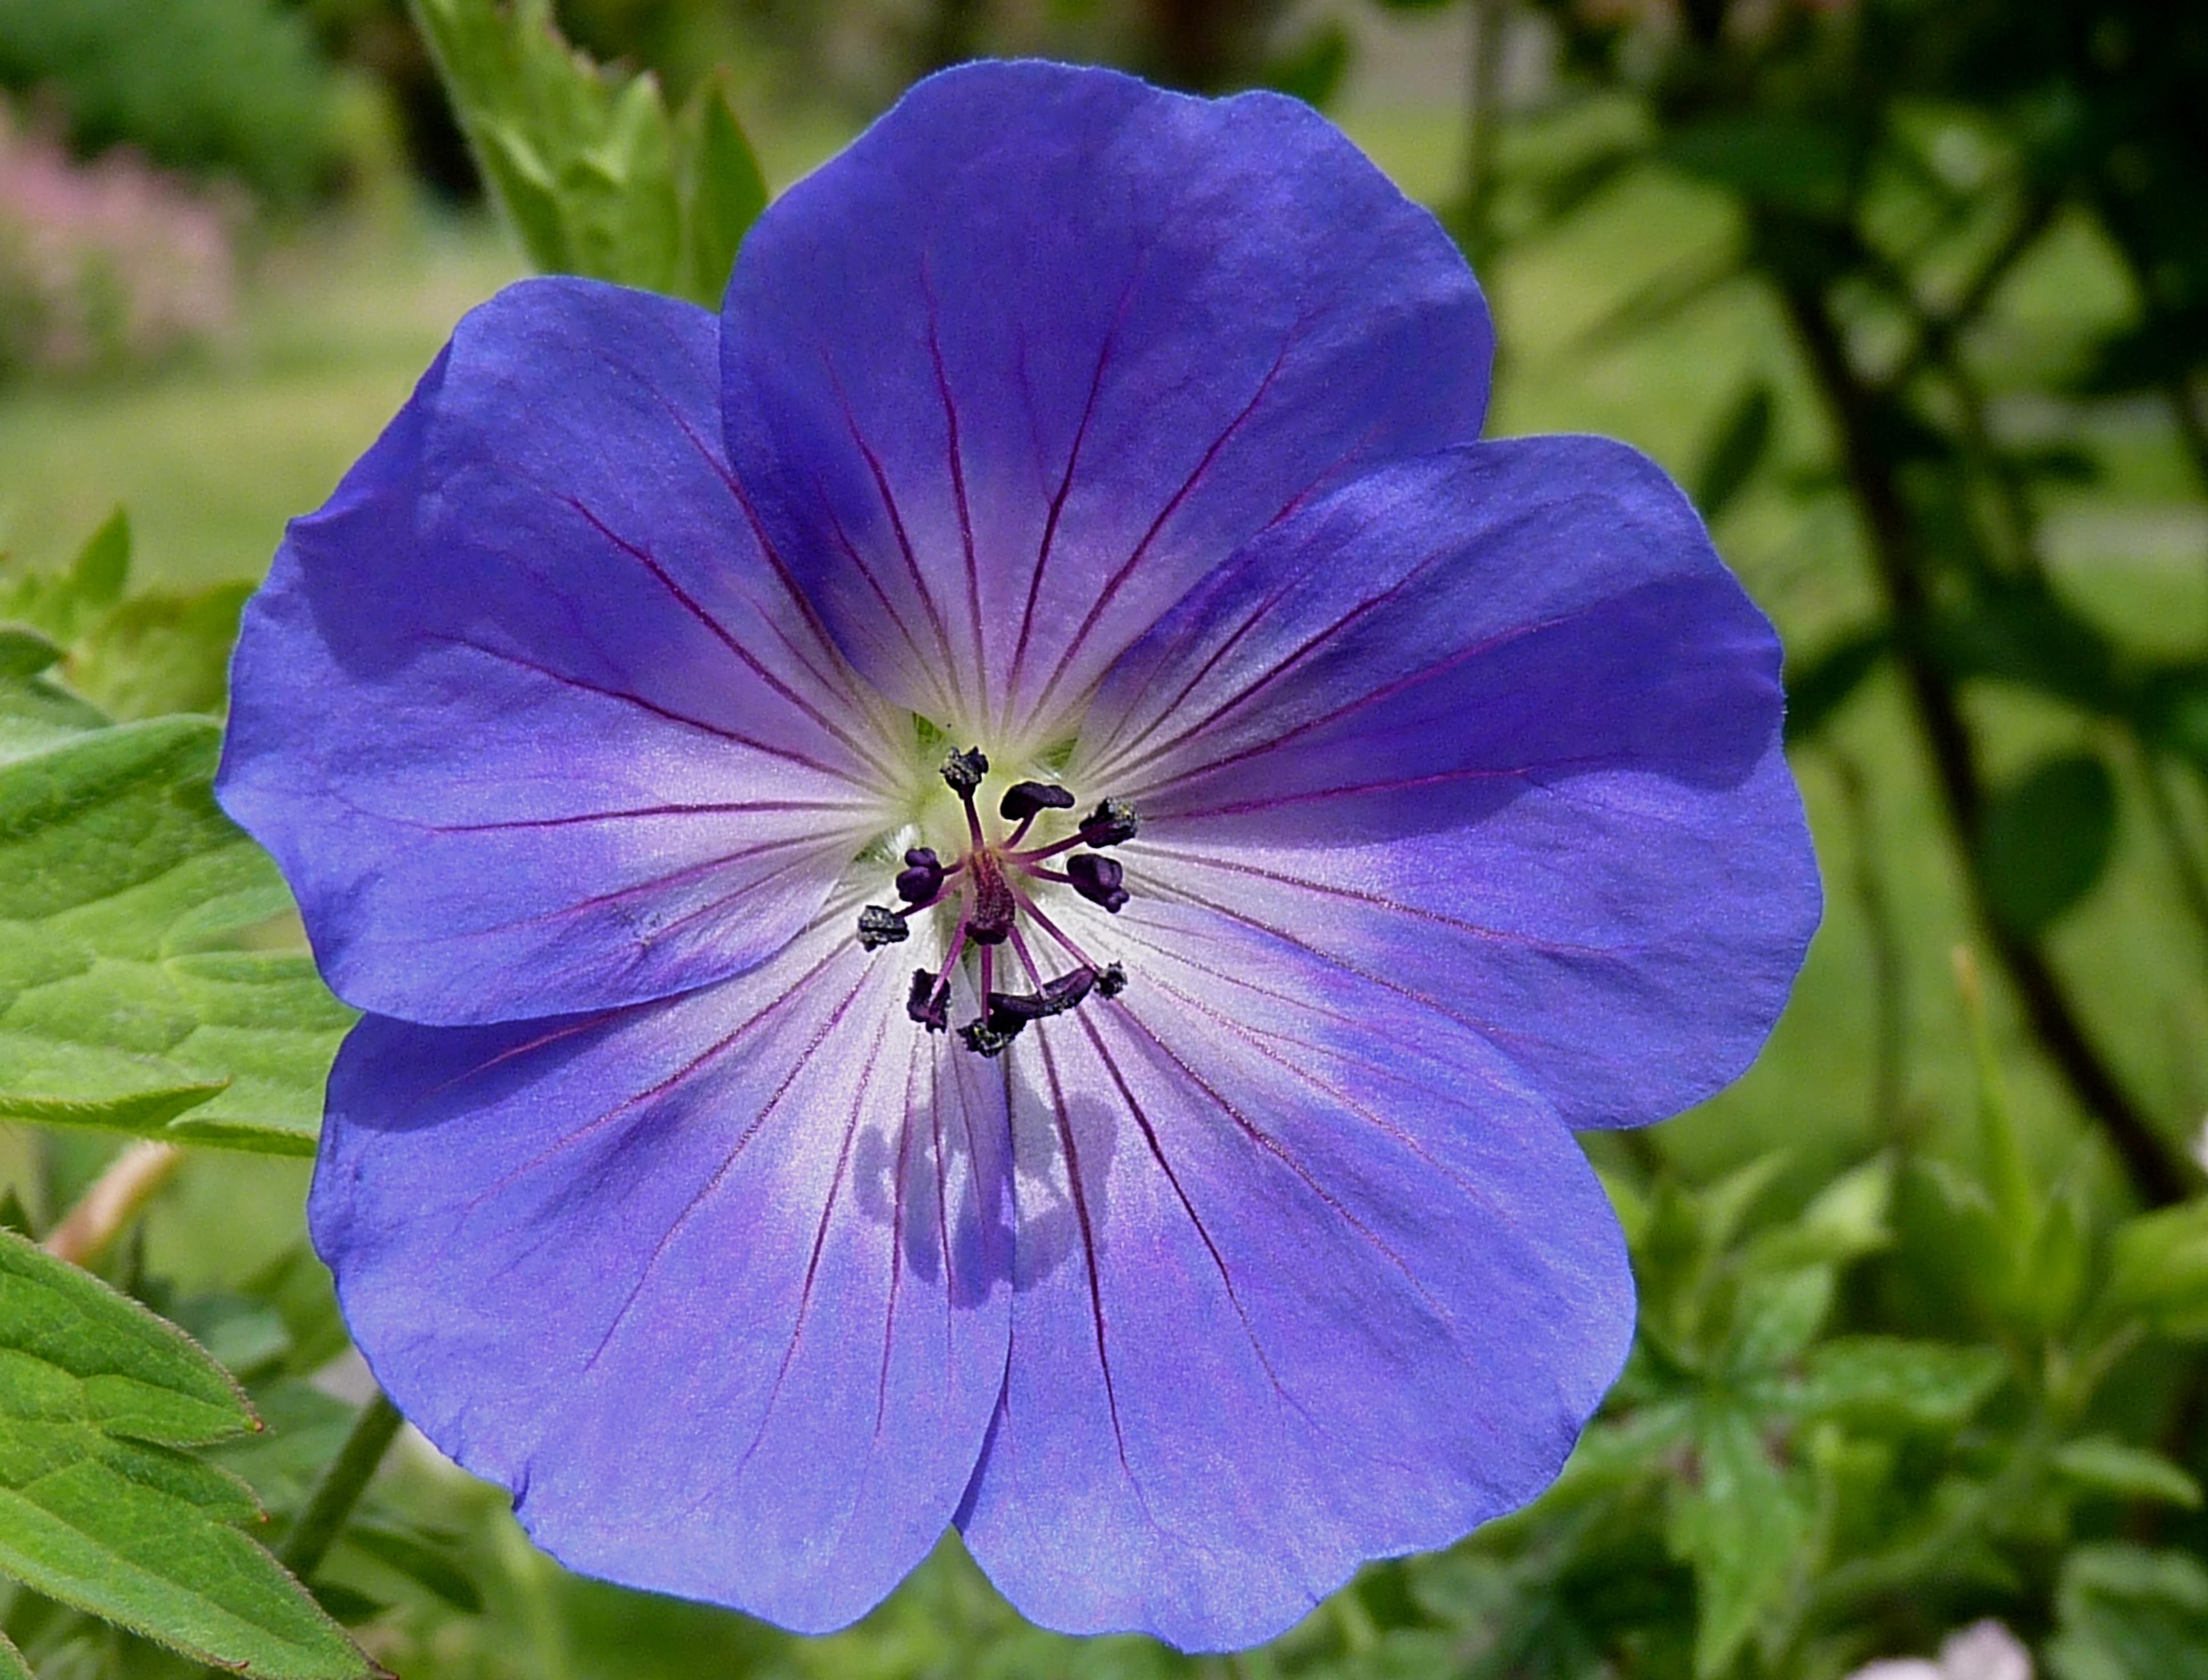 File:Geranium 'Rozanne' J1.jpg - Wikimedia Commons